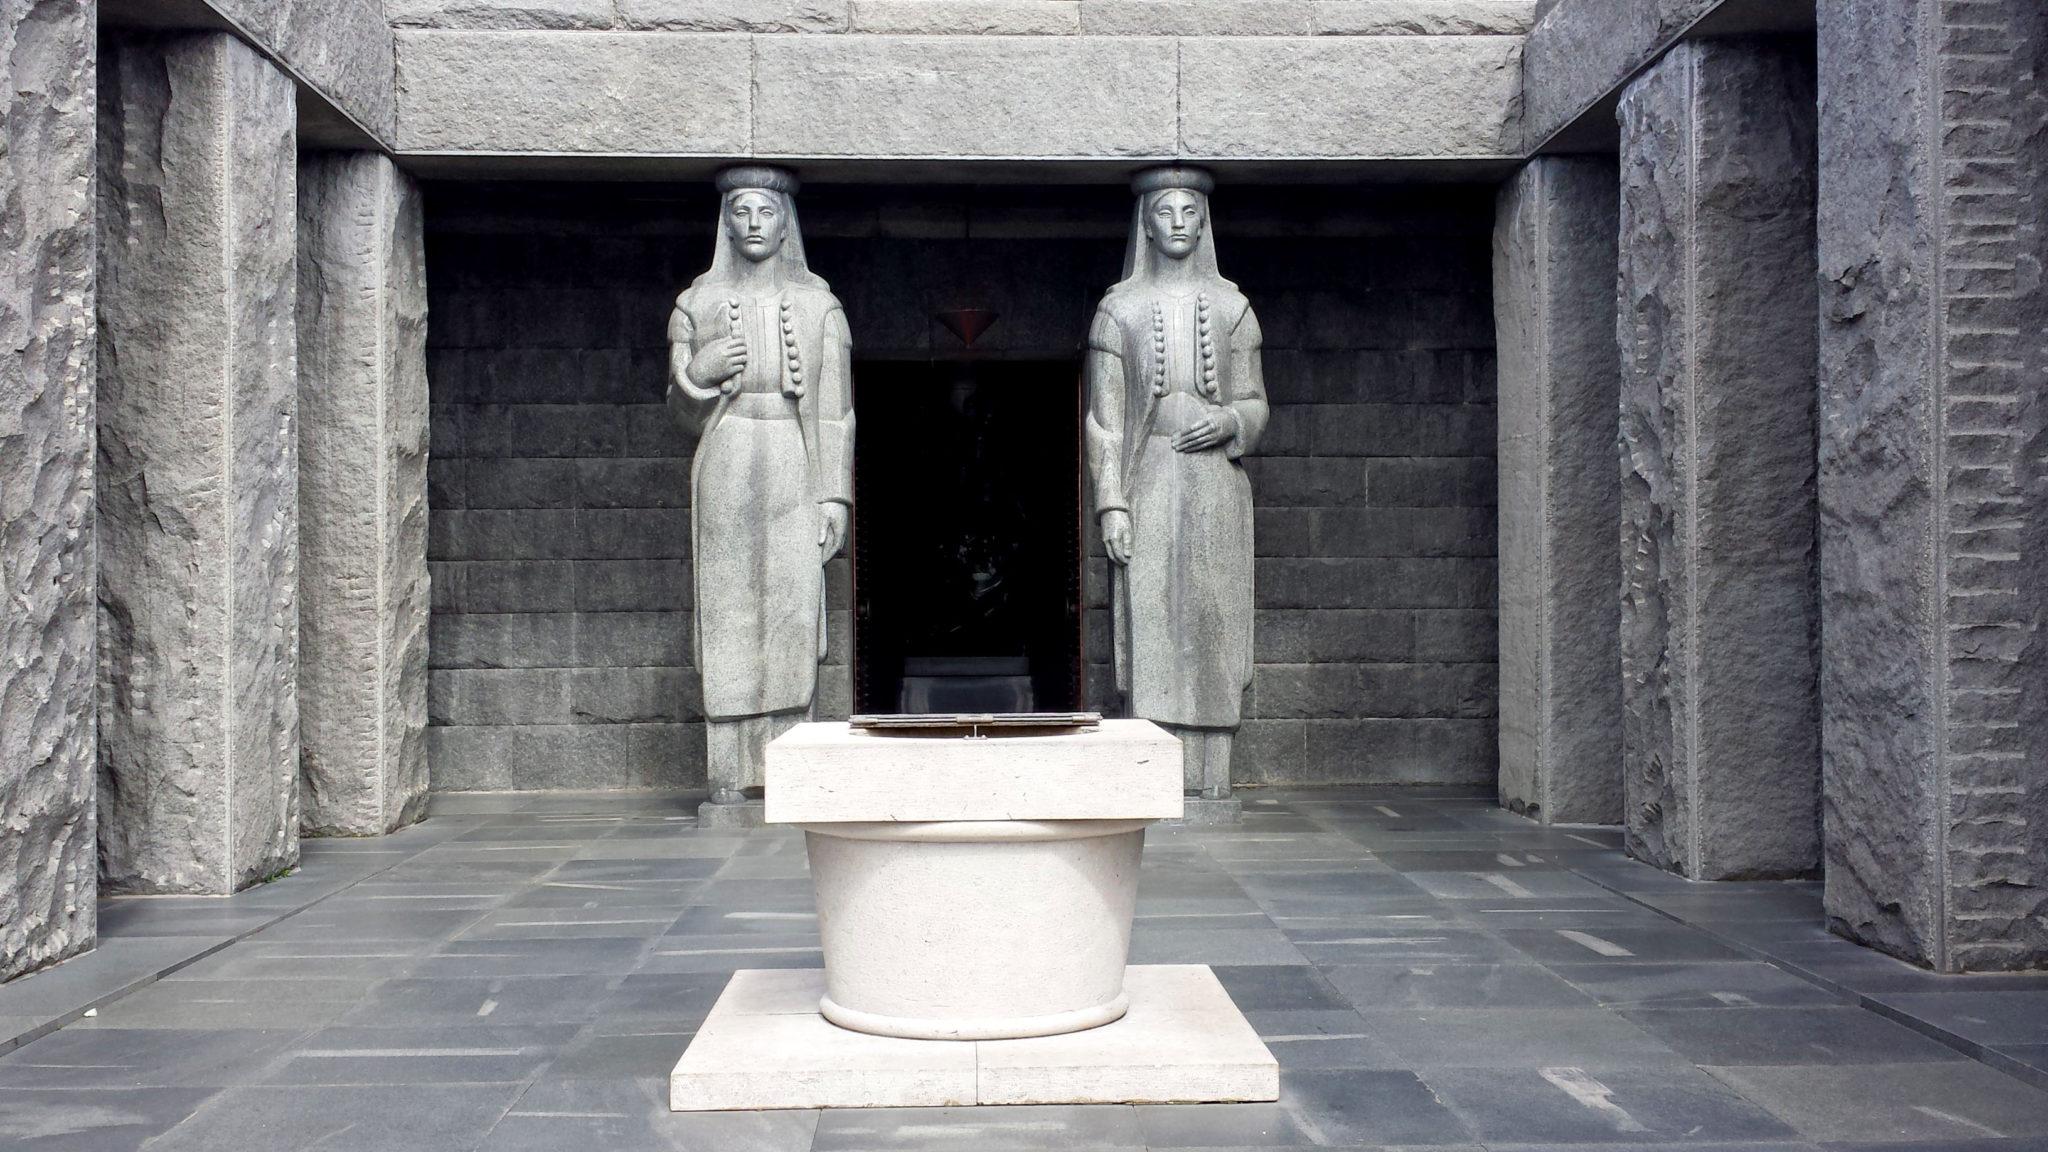 Hema_Le_parc_Lovcen_blog_voyage_travel_mausolee_nejegos12